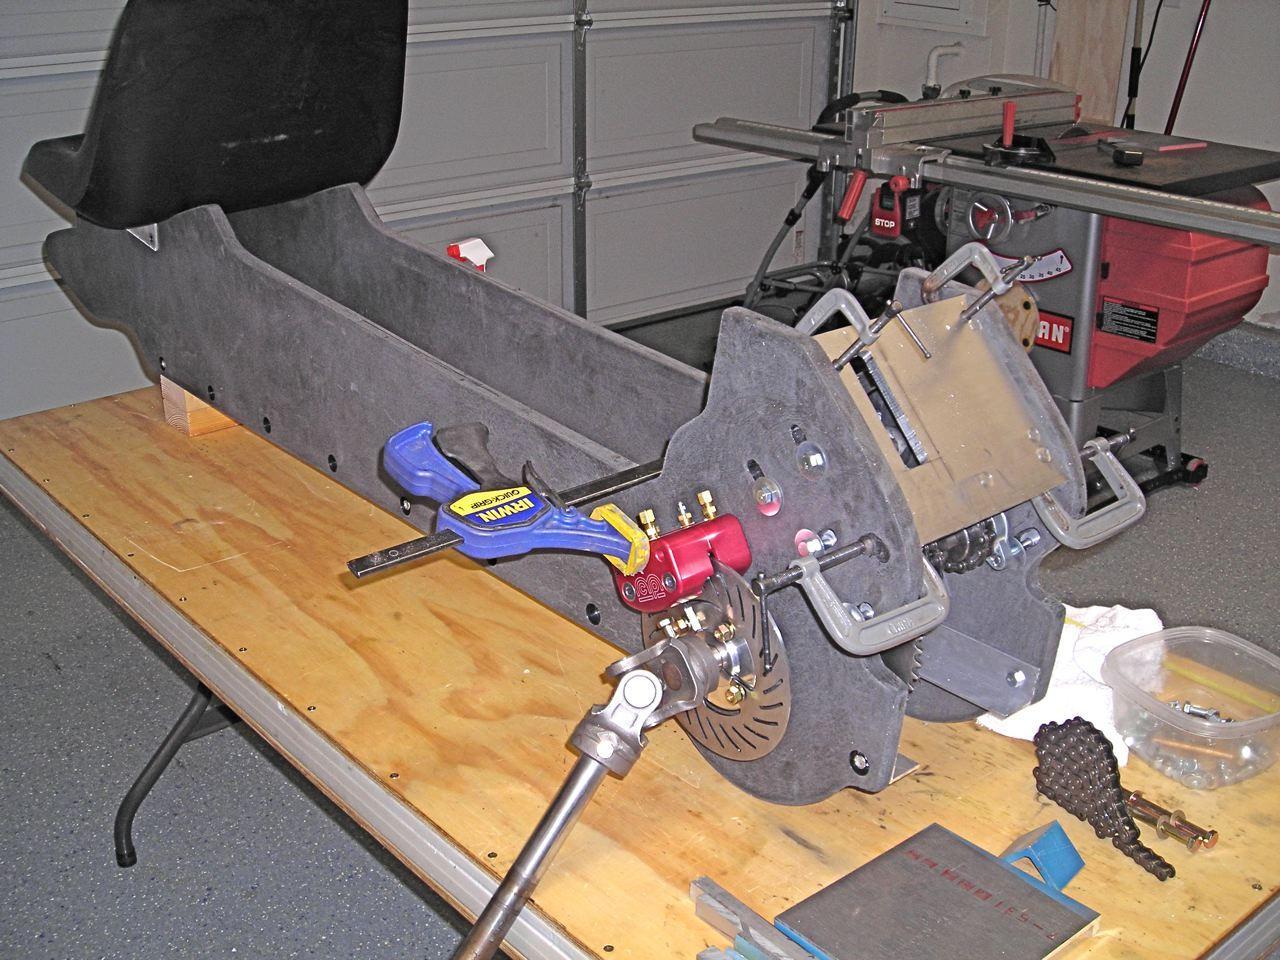 The Z-Kart under construction